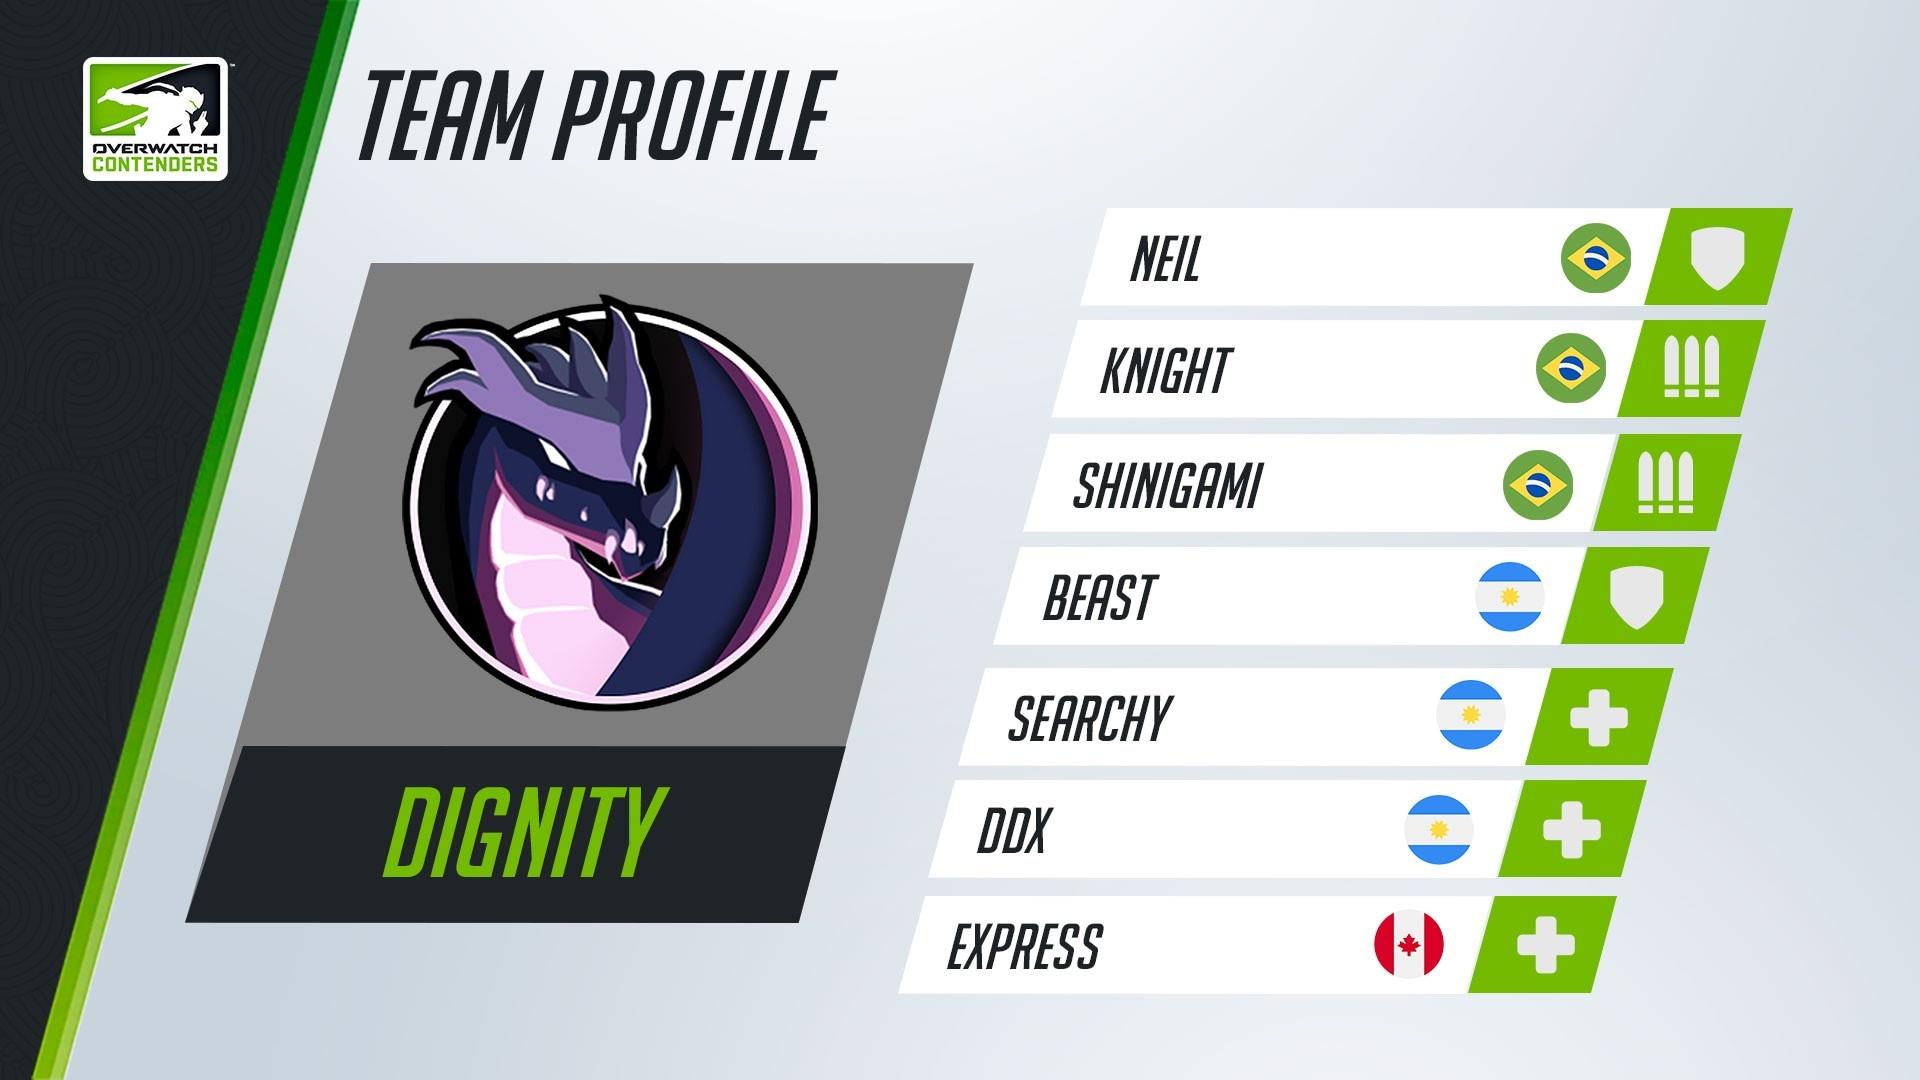 Dignity4.jpg